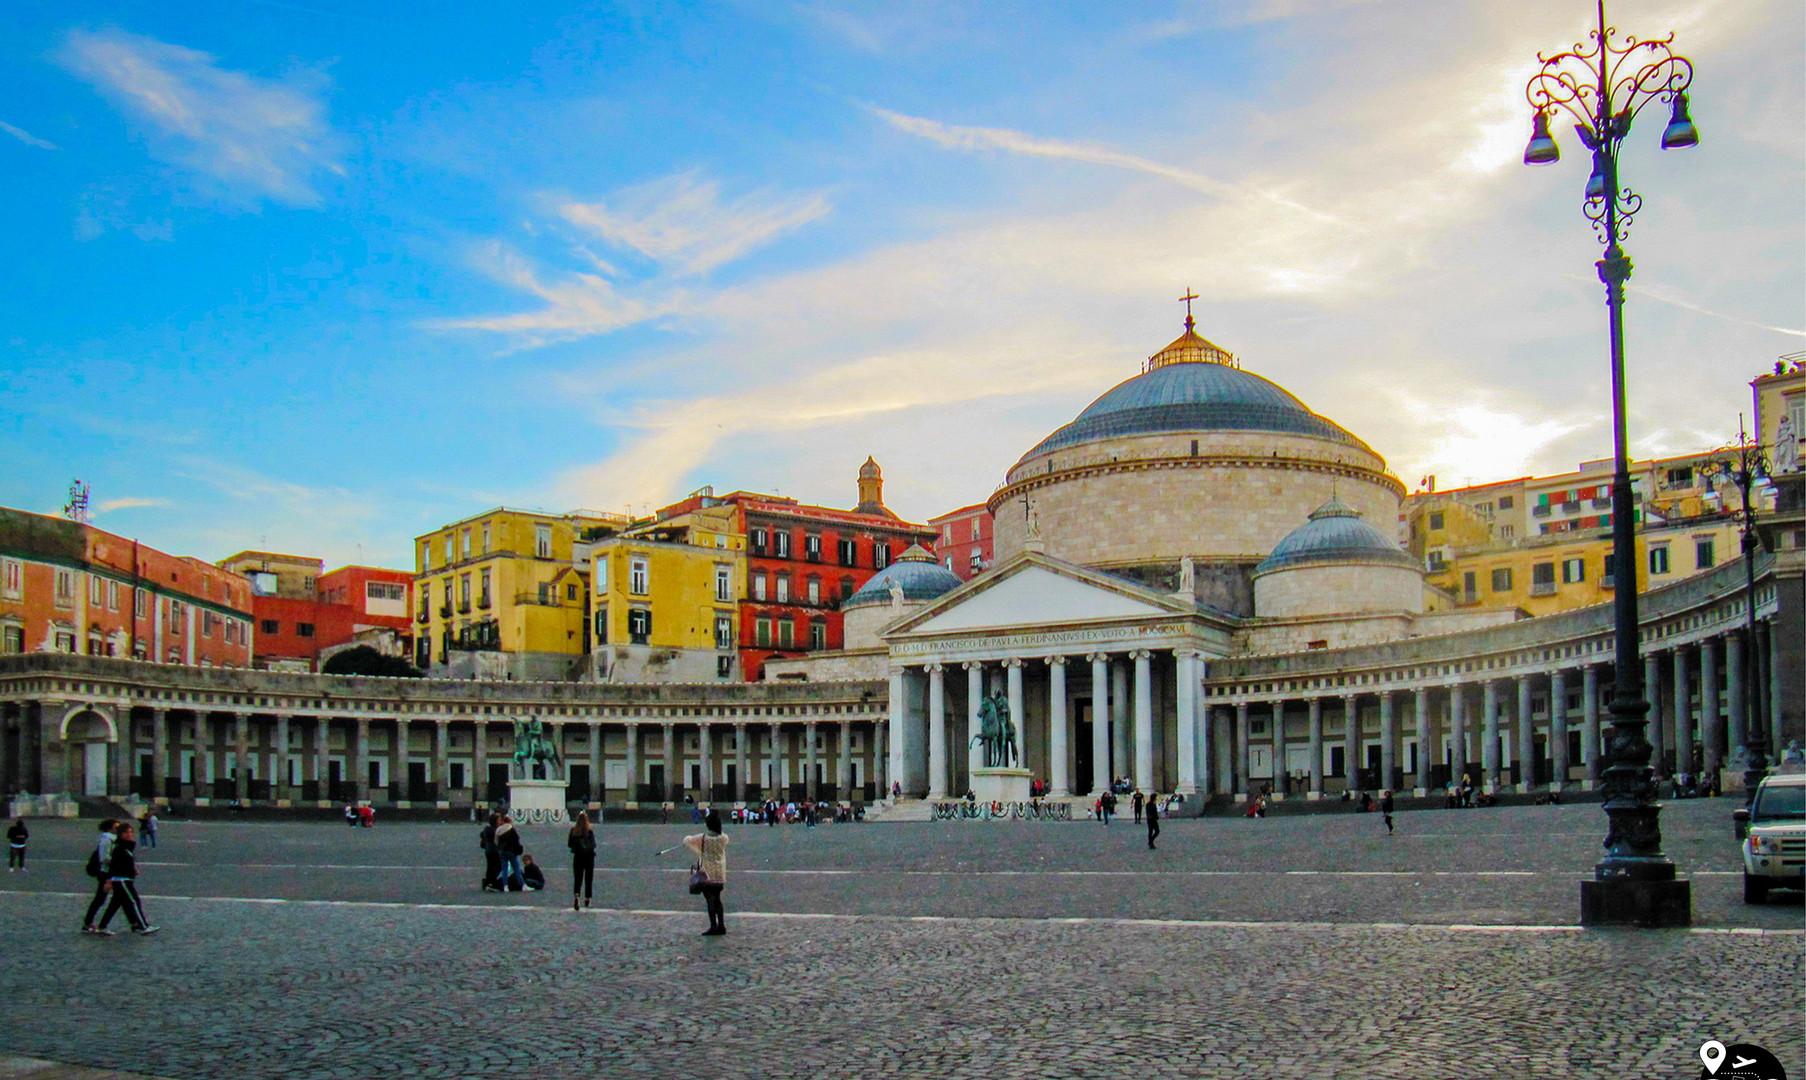 Площадь Плебисцита, Неаполь